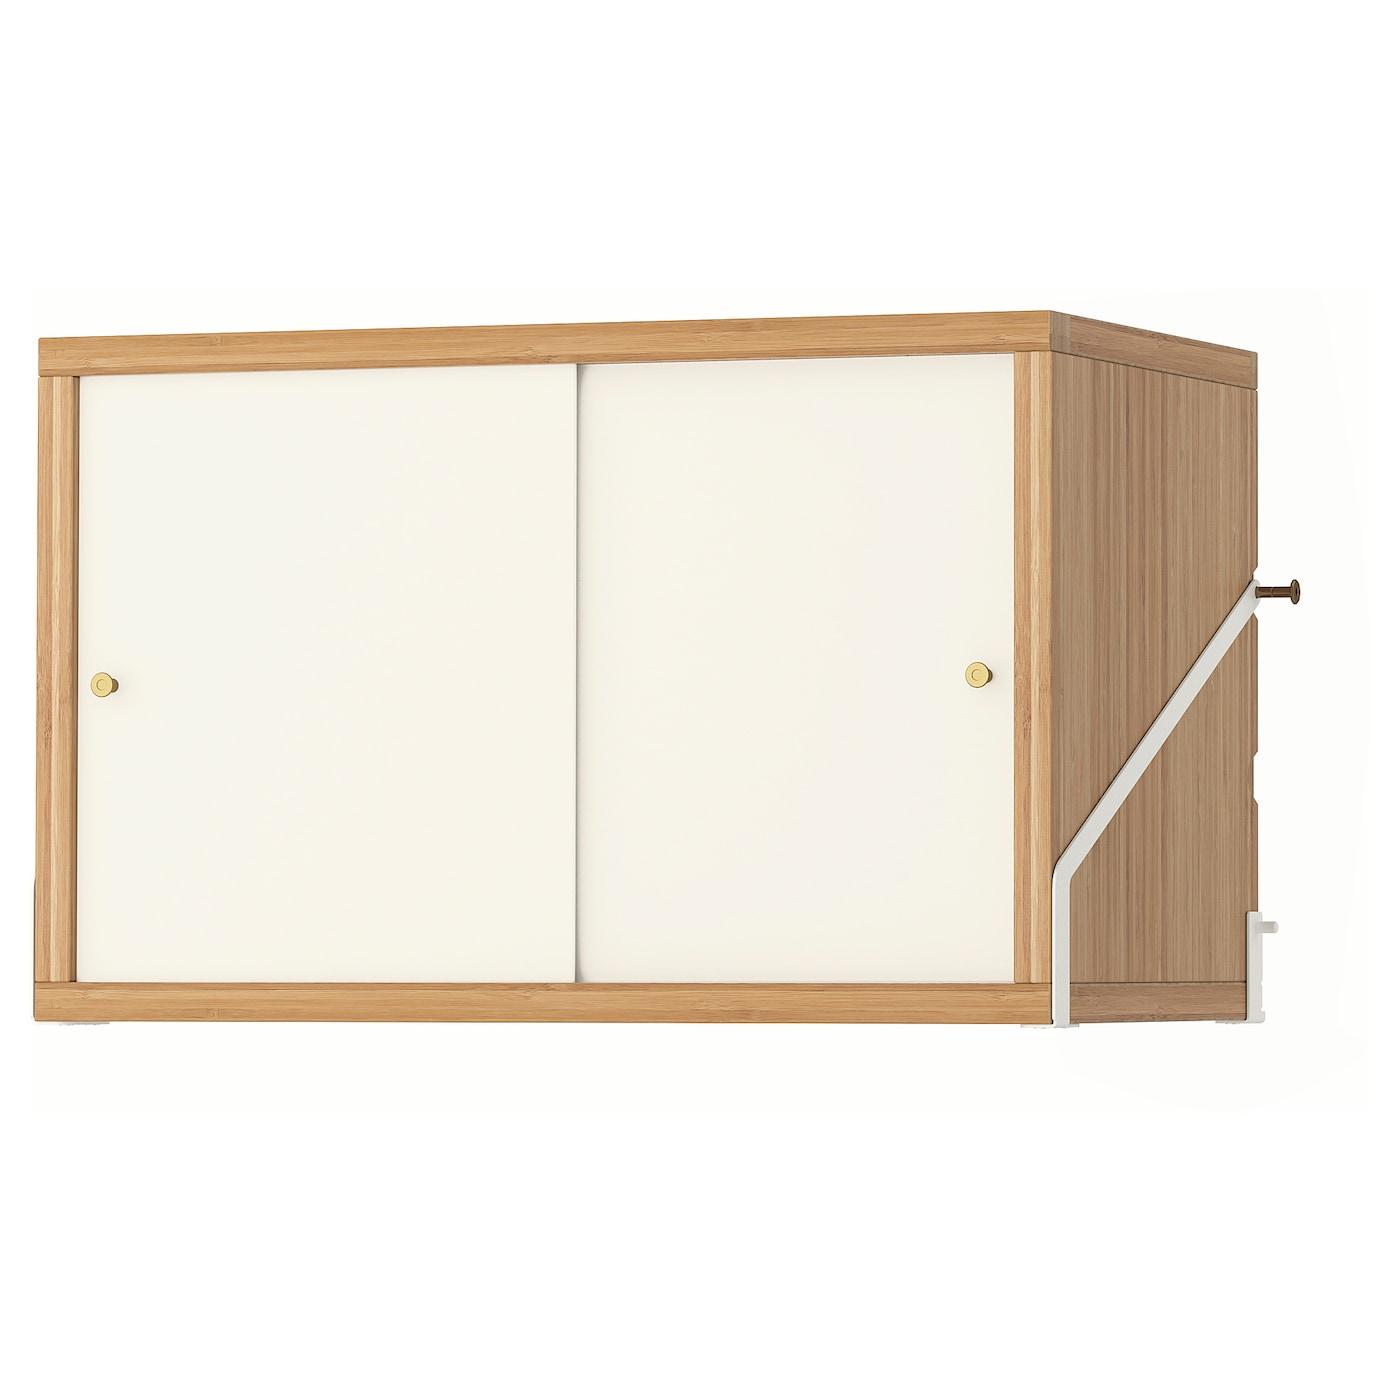 Svalnas Bamboo White Cabinet With 2 Doors 61x35 Cm Ikea